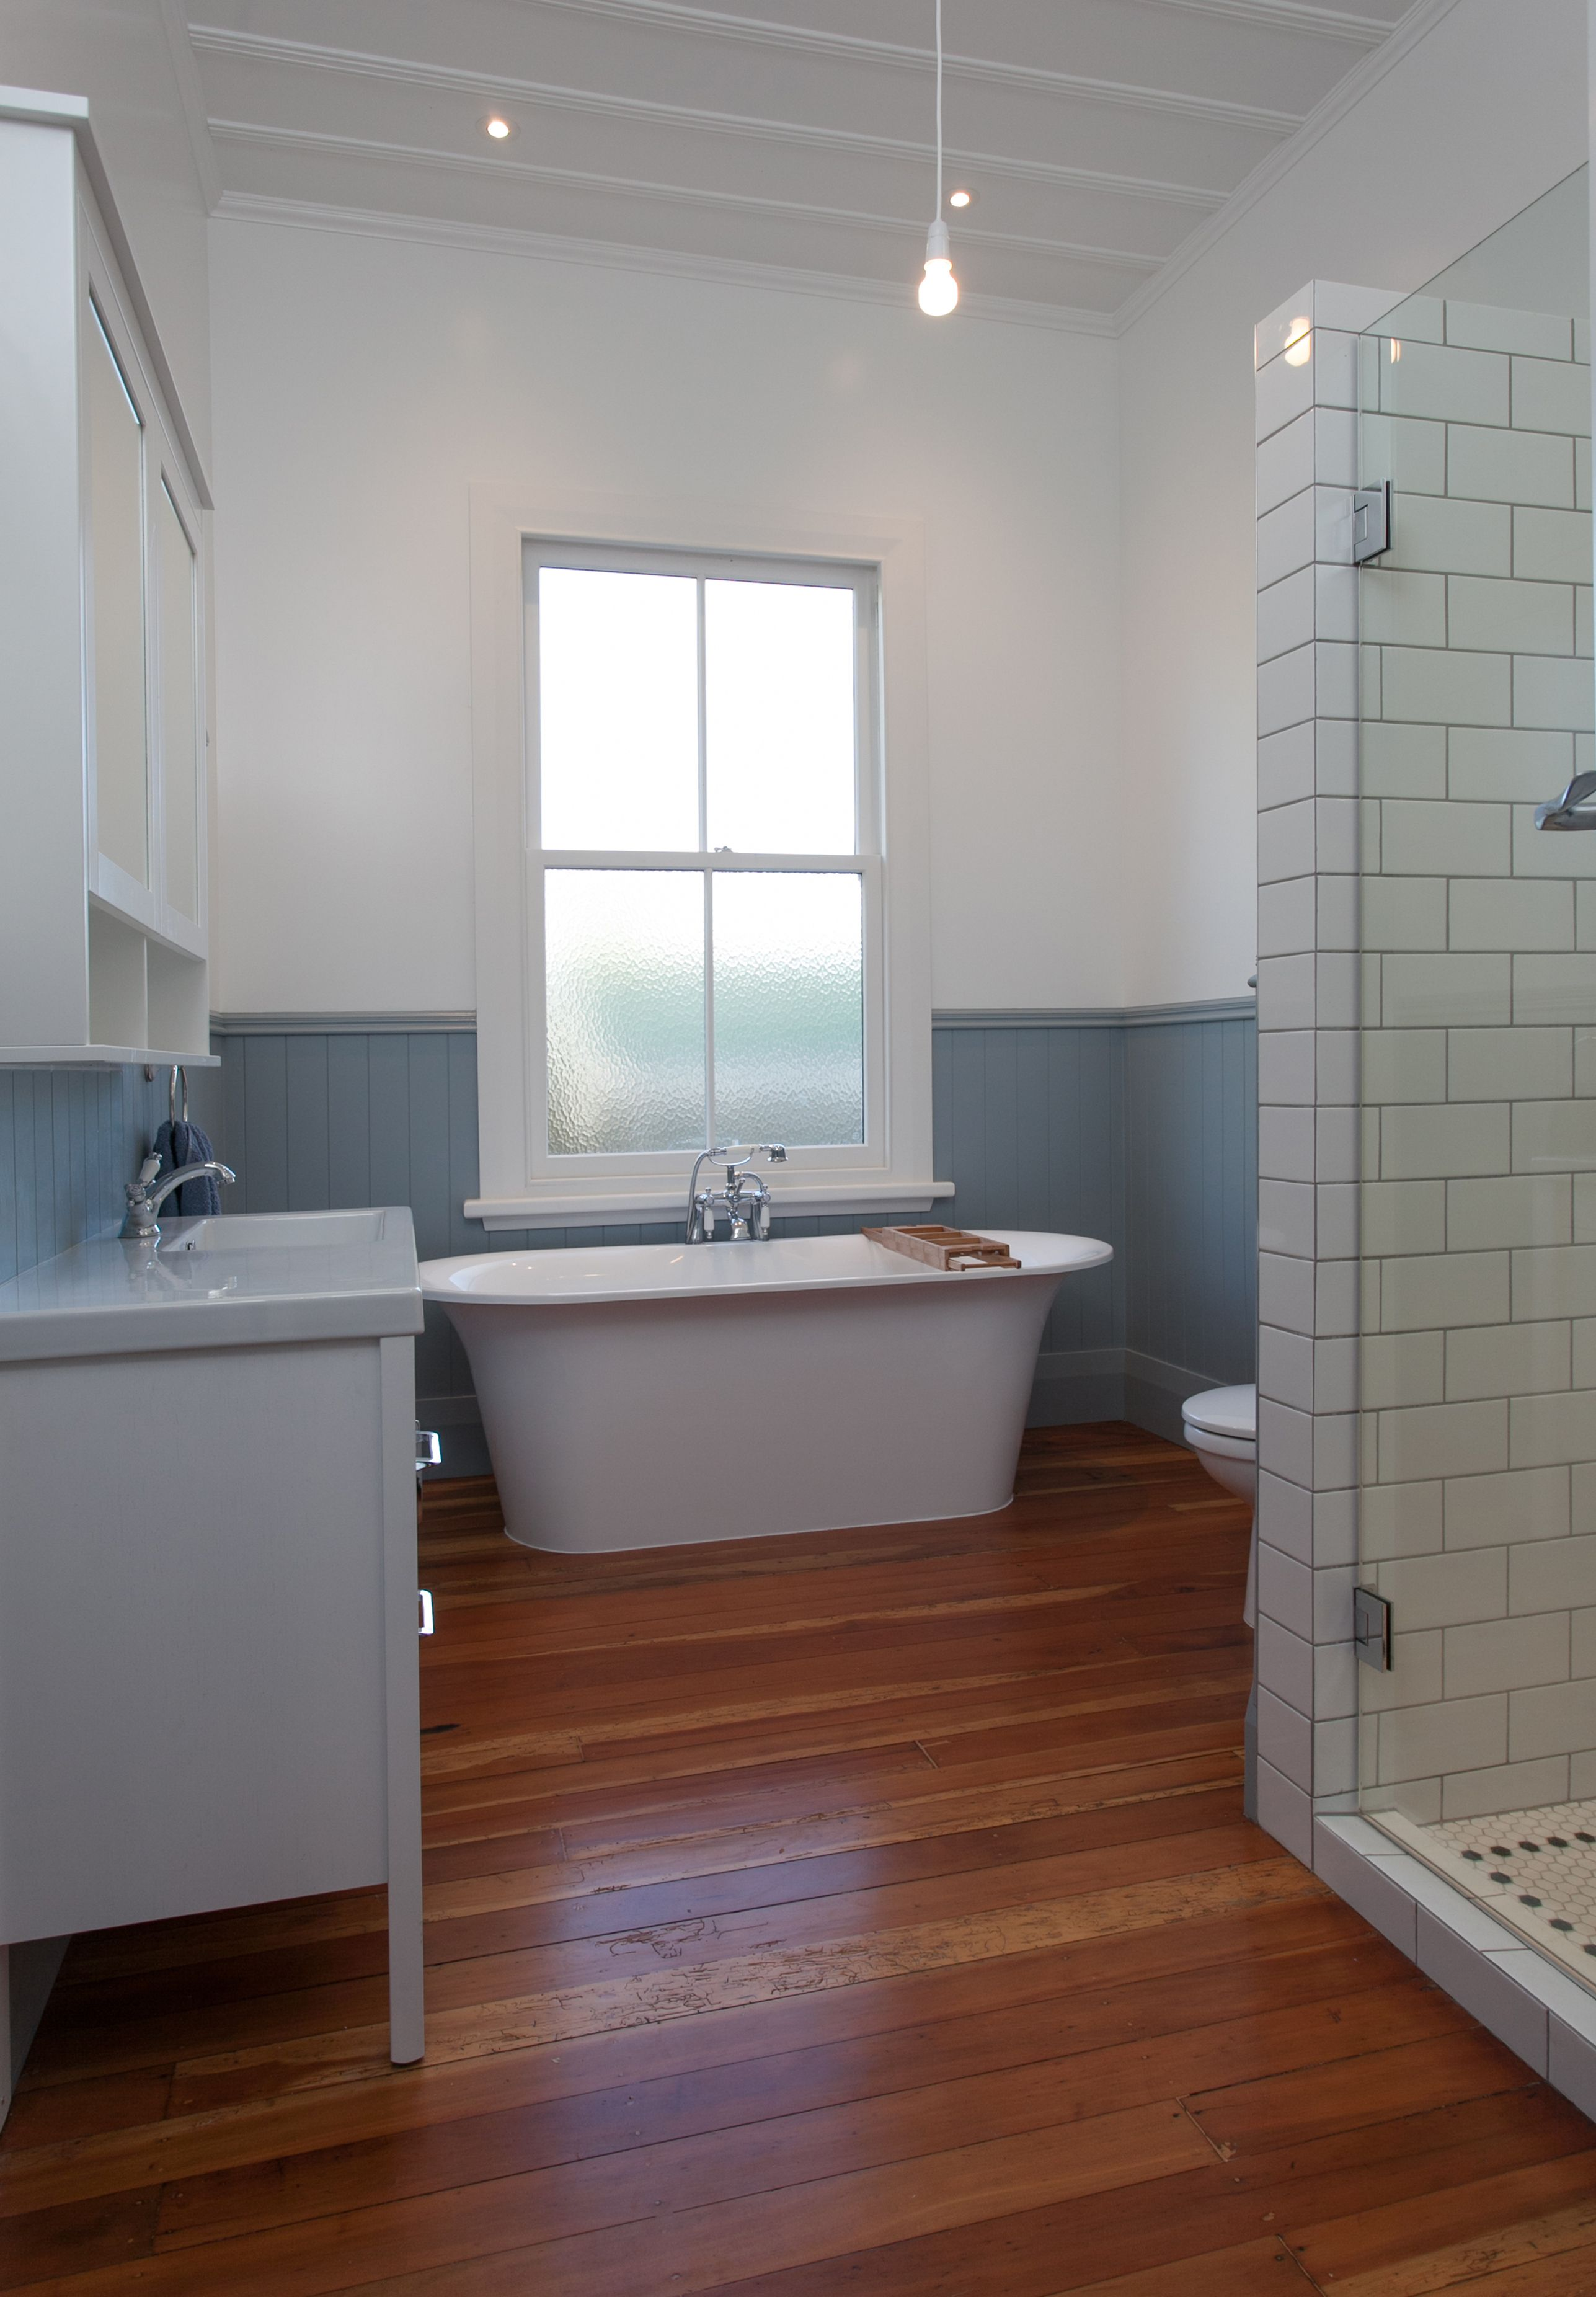 renovated bathroom to 1900 s villa cambridge new on bathroom renovation ideas nz id=88501